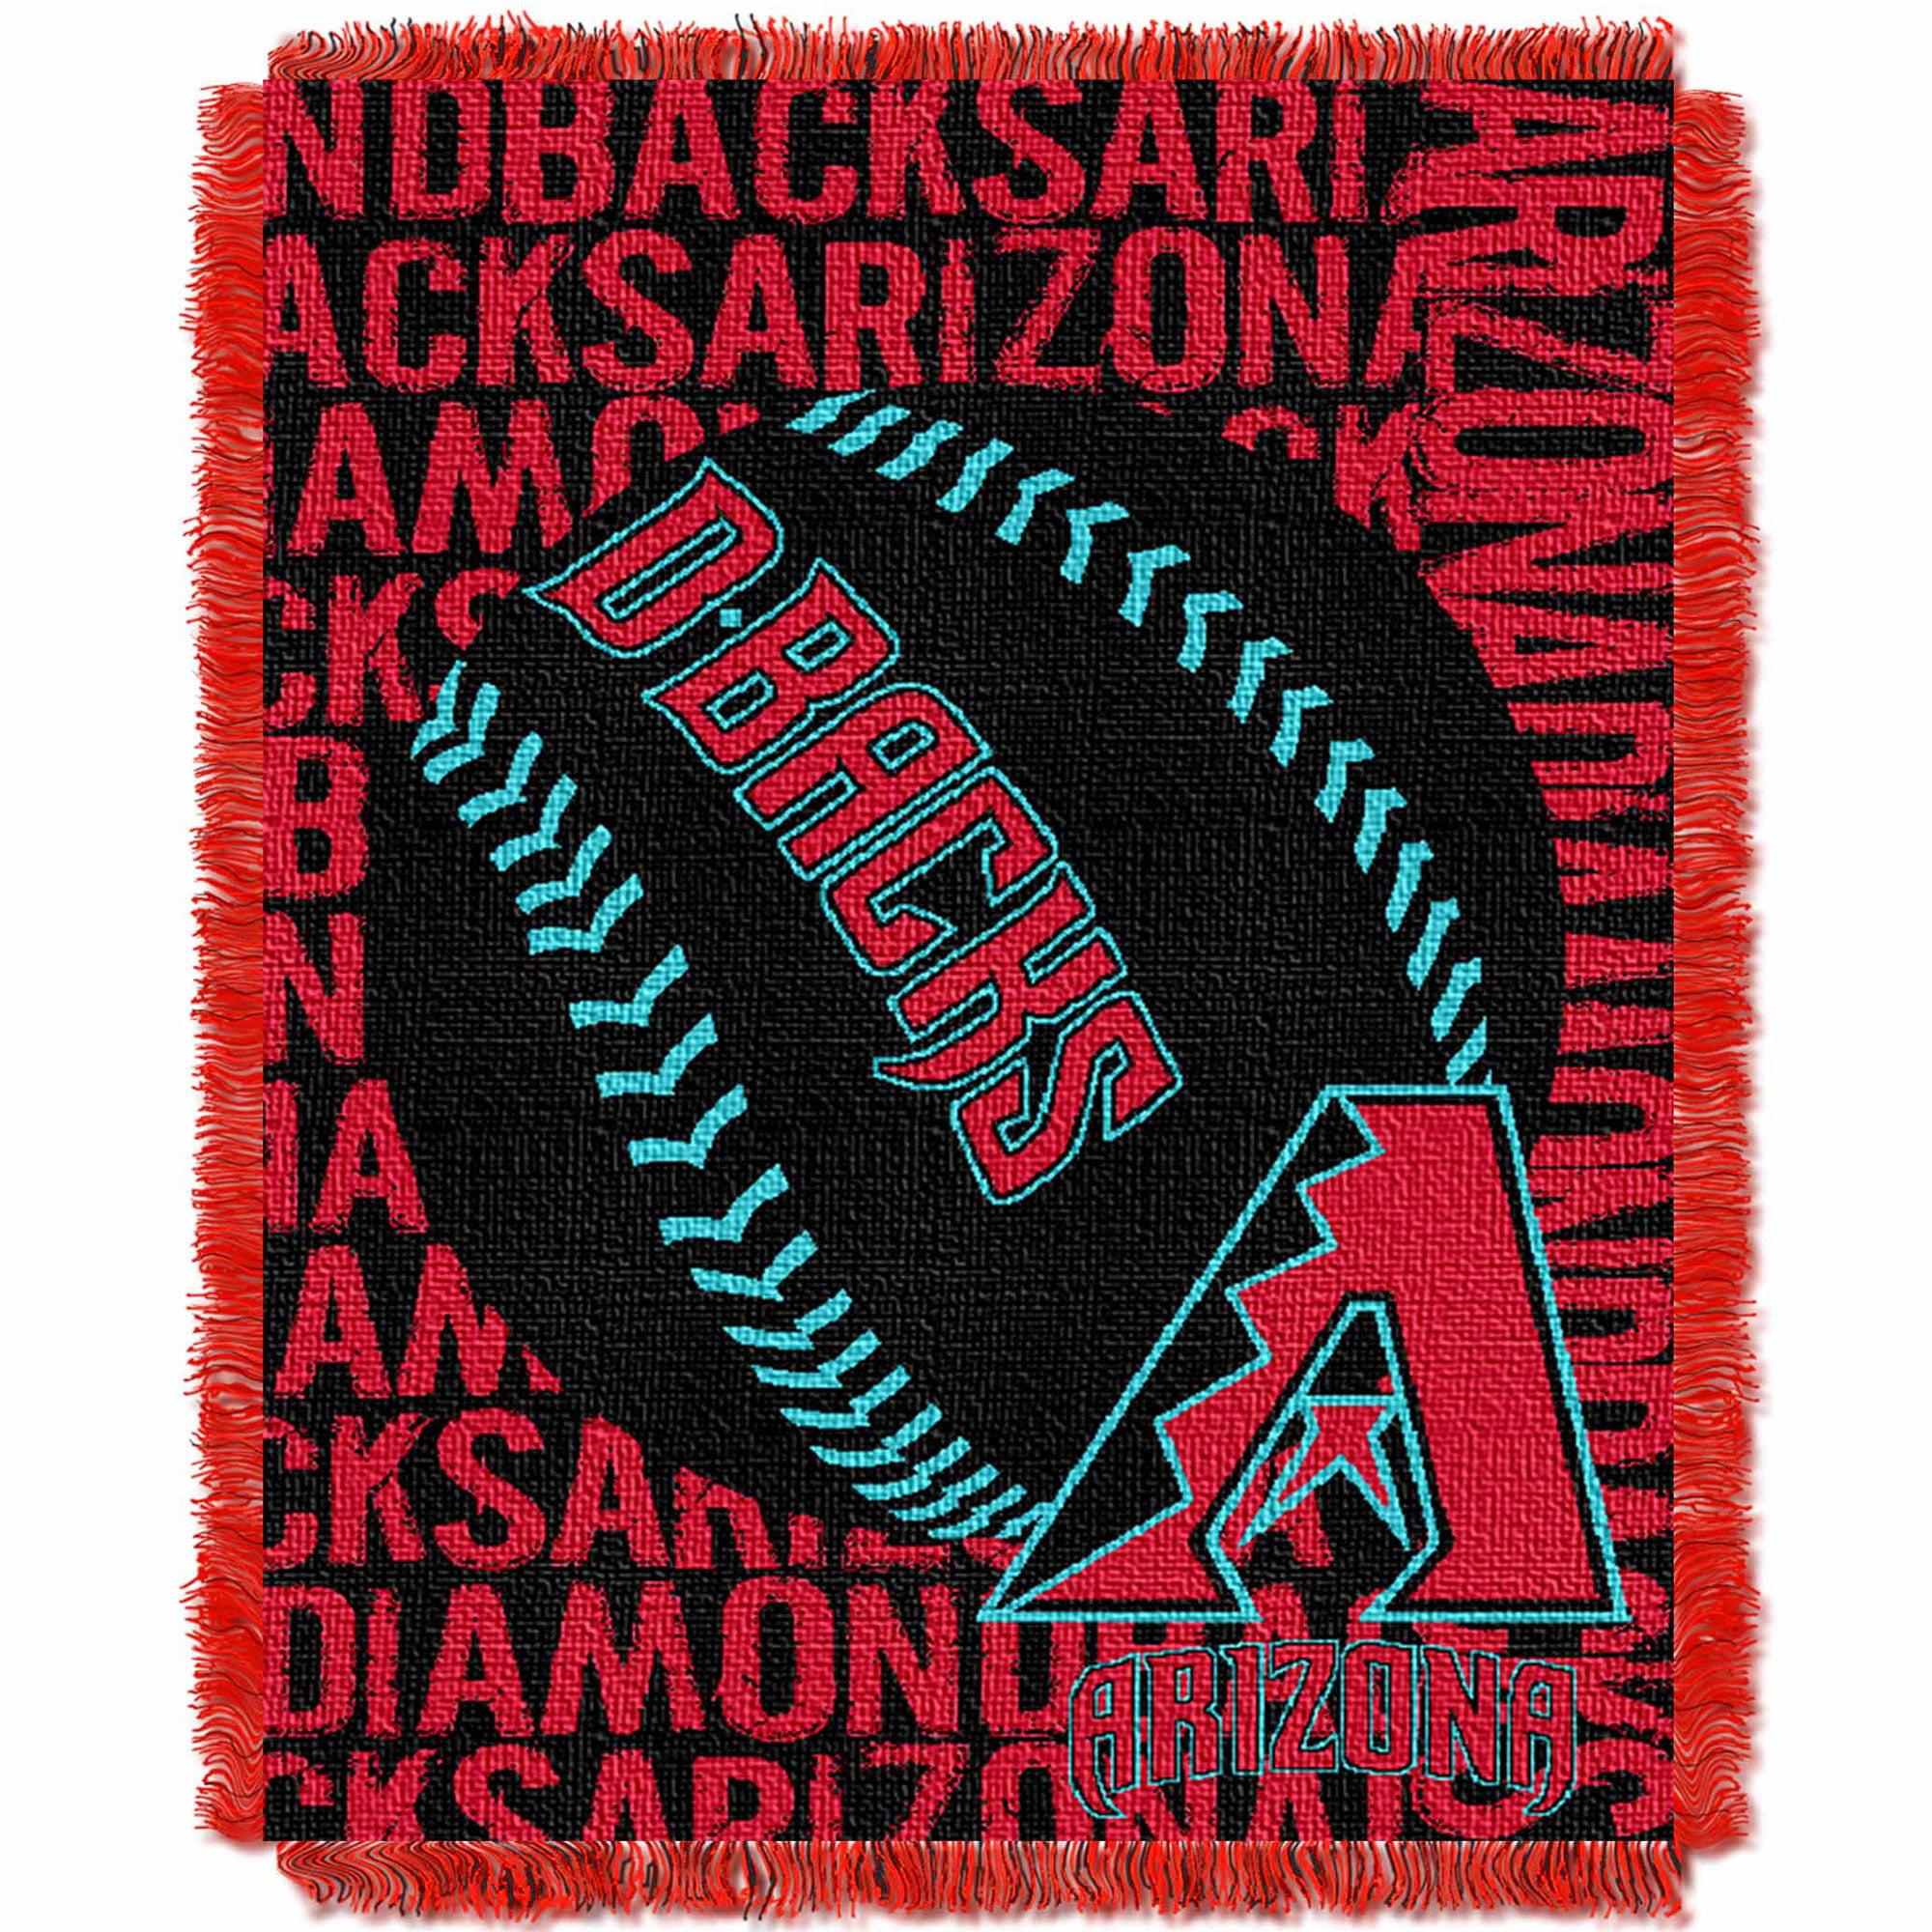 Arizona Diamondbacks The Northwest Company 46'' x 60'' Double Play Jacquard Throw - No Size